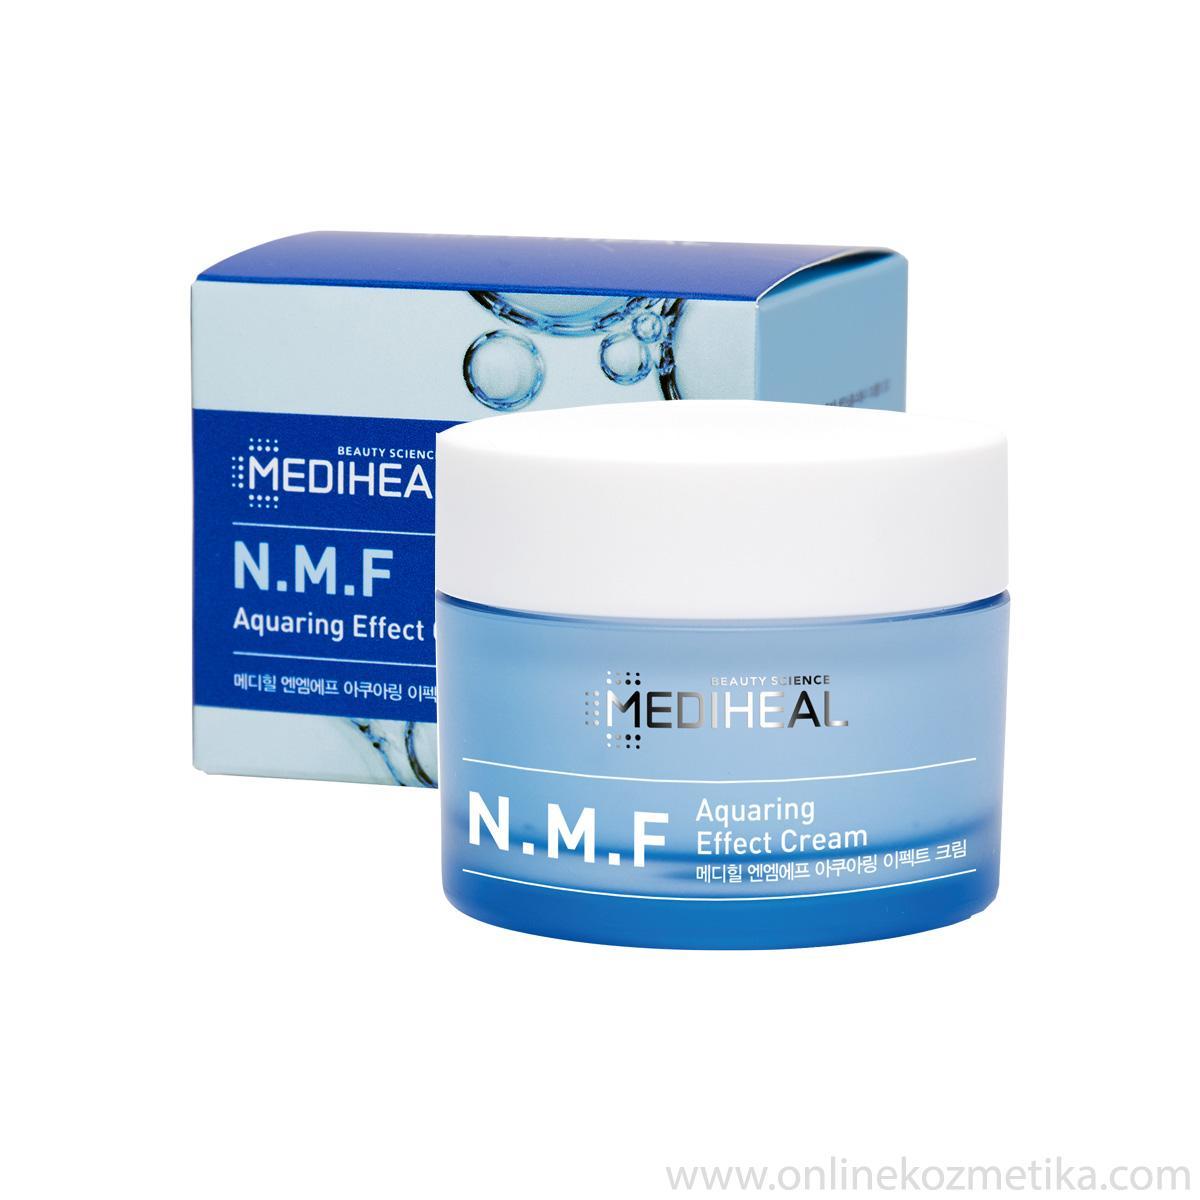 Mediheal N.M.F Aquaring Effect Cream